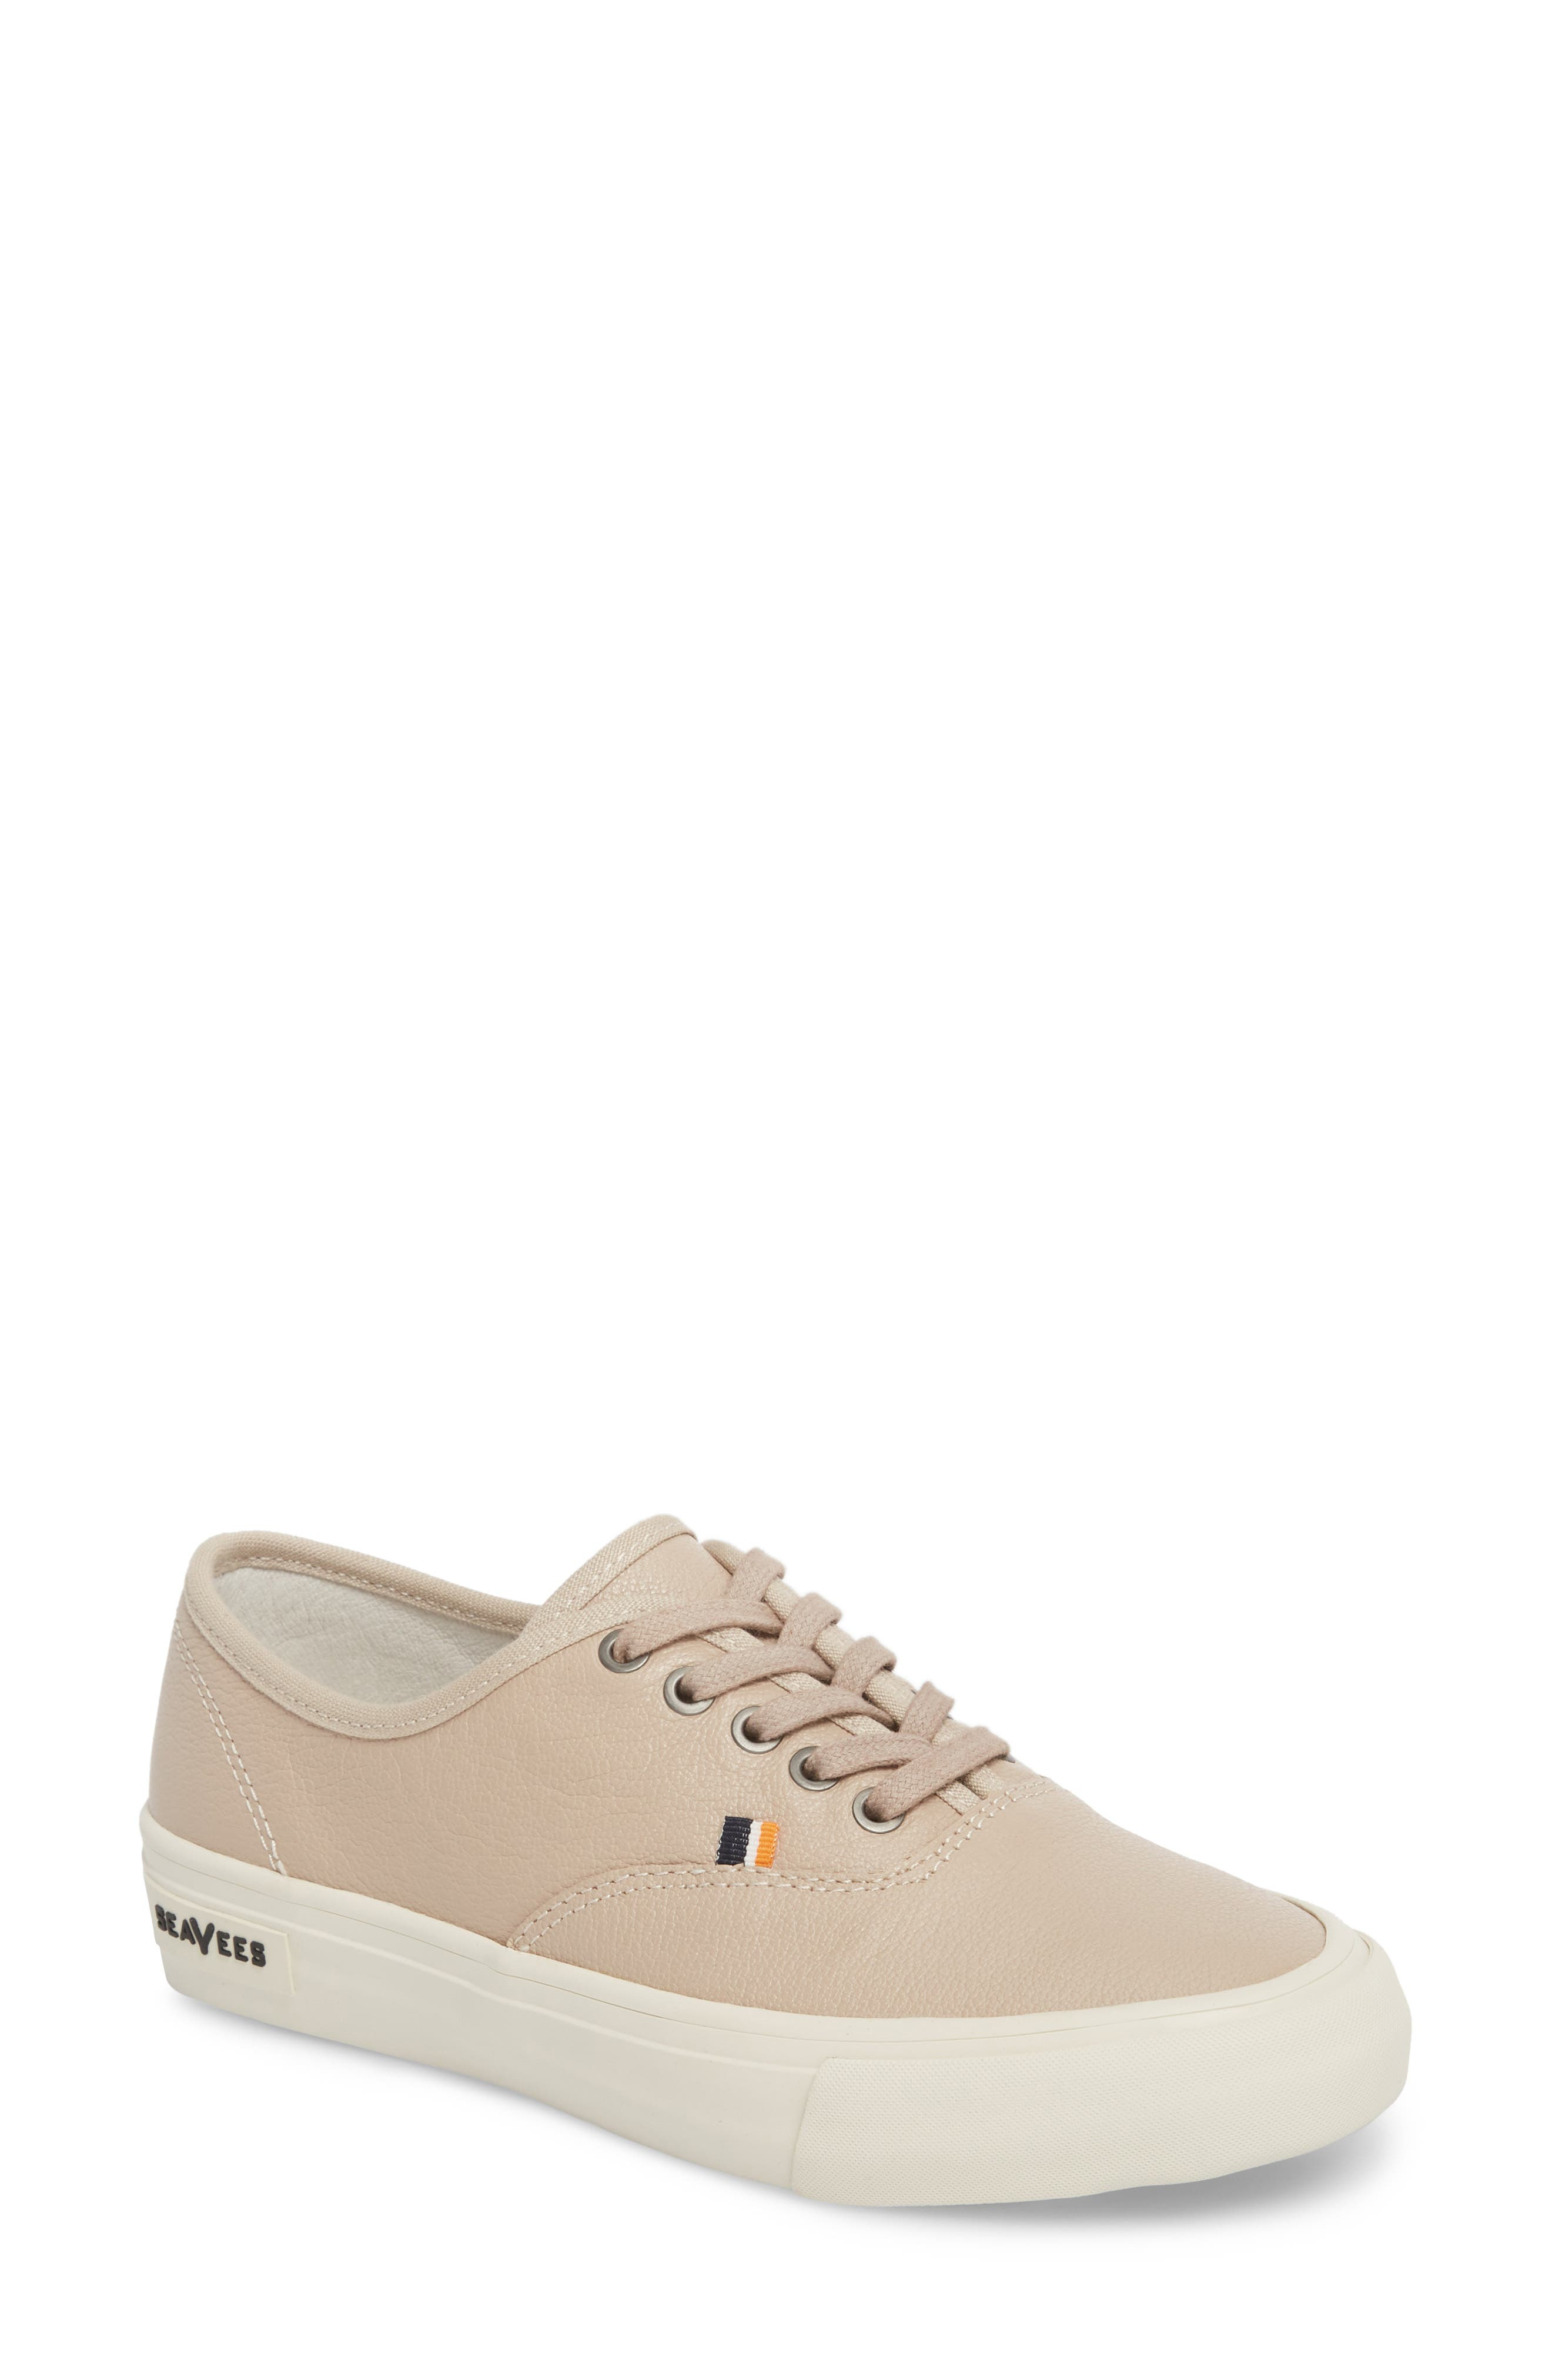 x Derek Lam 10 Crosby Legend Caballero Sneaker,                             Main thumbnail 1, color,                             Bisque